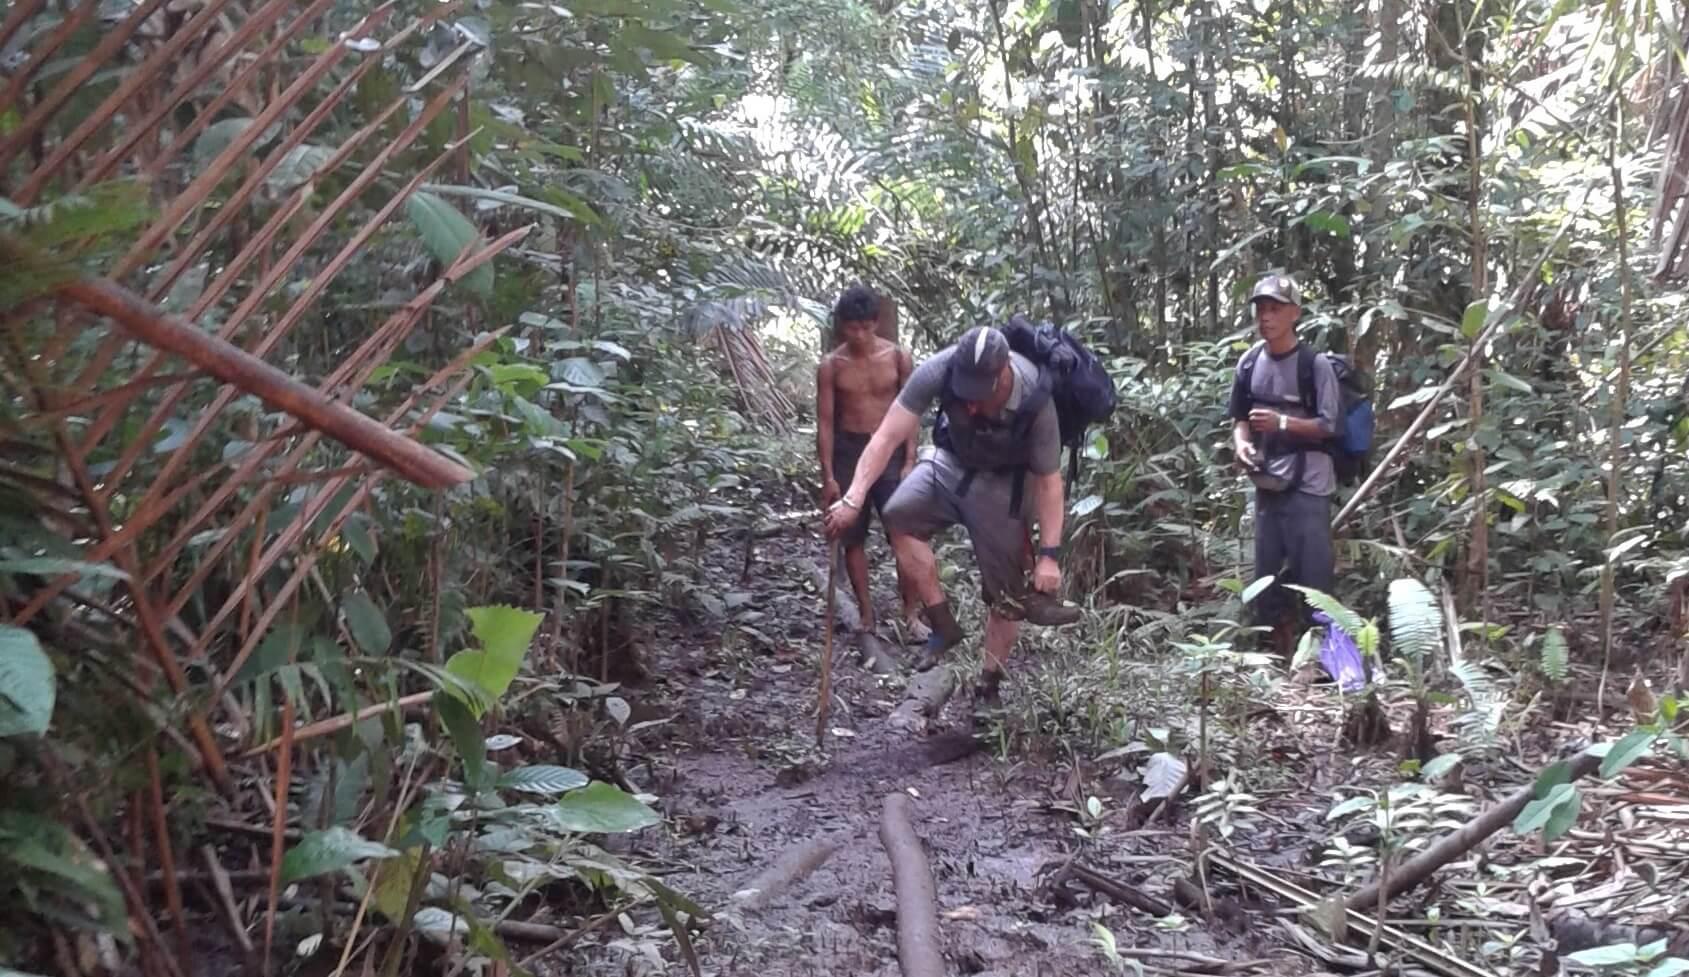 Trekking dans la jungle de Siberut Mentawai Sumatra